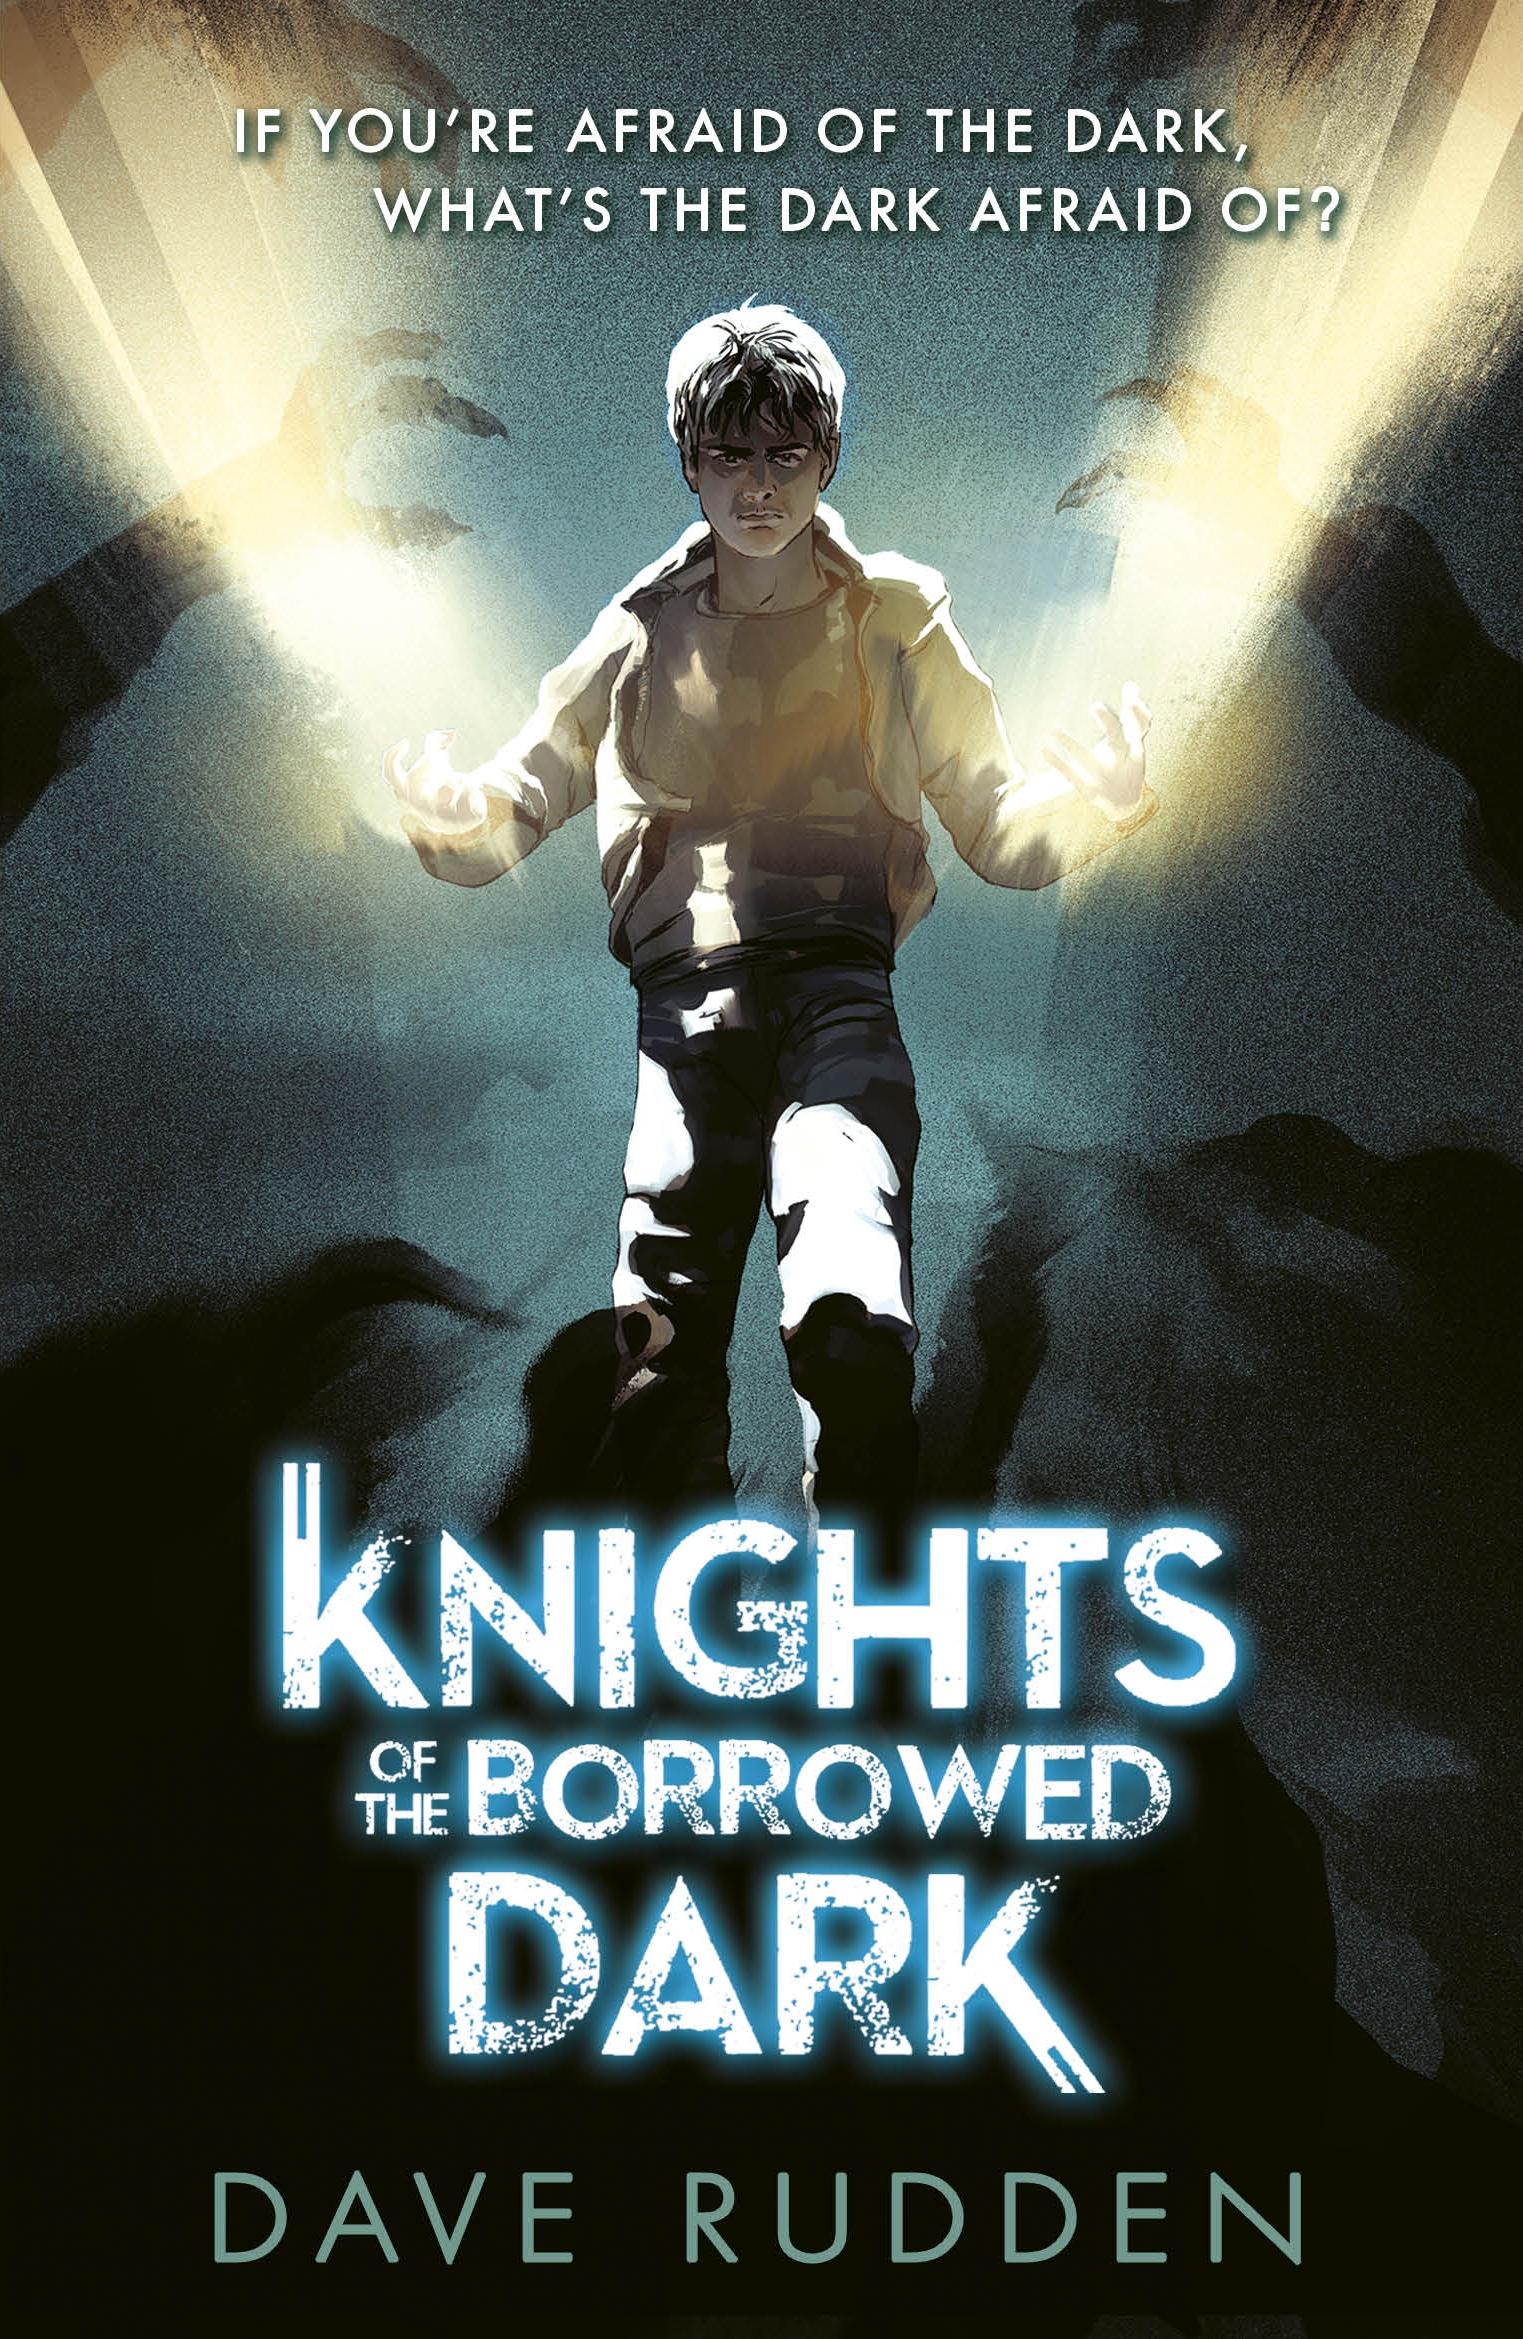 Knights of the Borrowed Dark.jpg